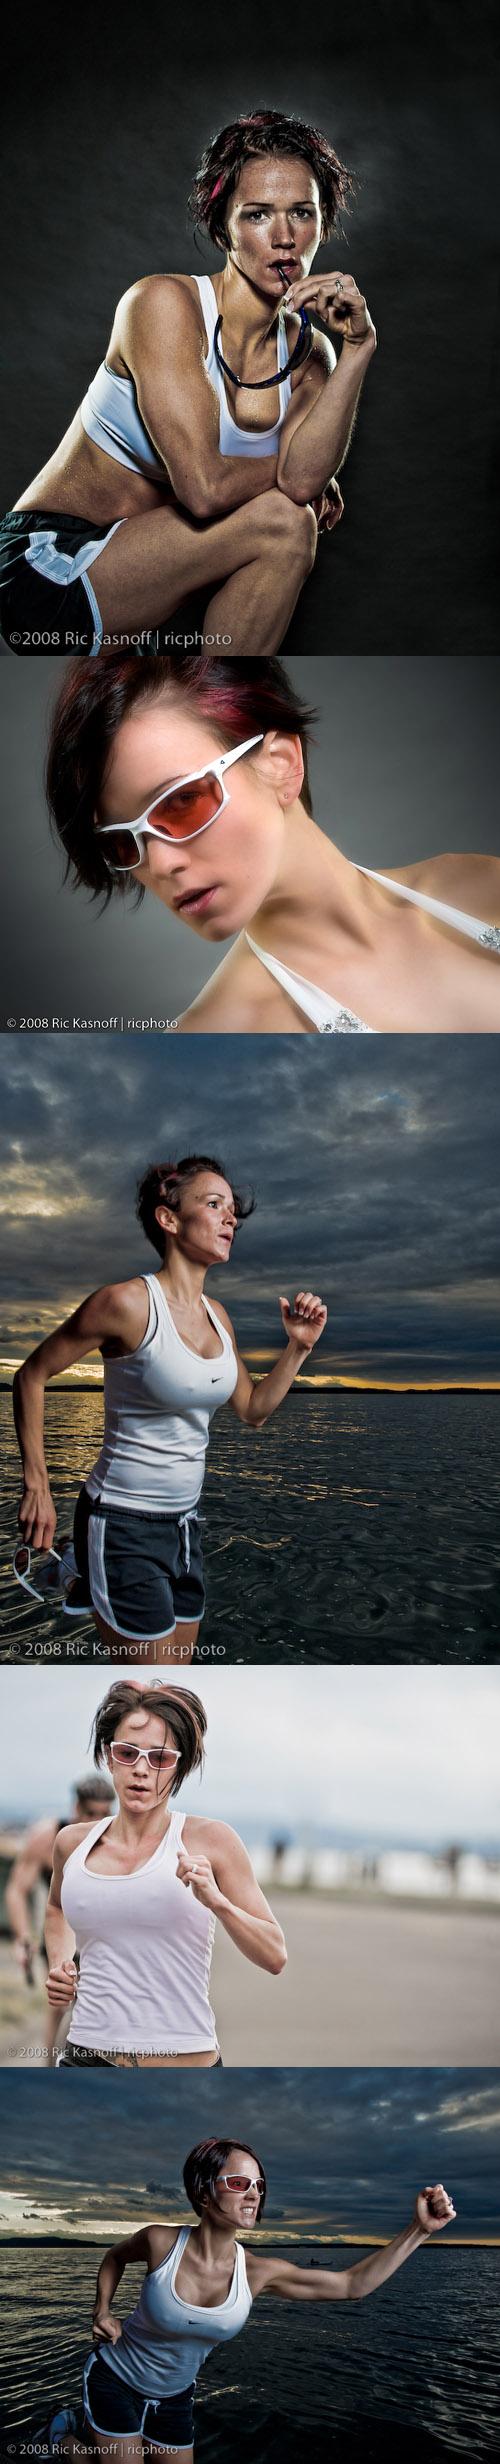 Alki Beach May 24, 2008 Ric Kasnoff Fitness Sunglass ad on Alki